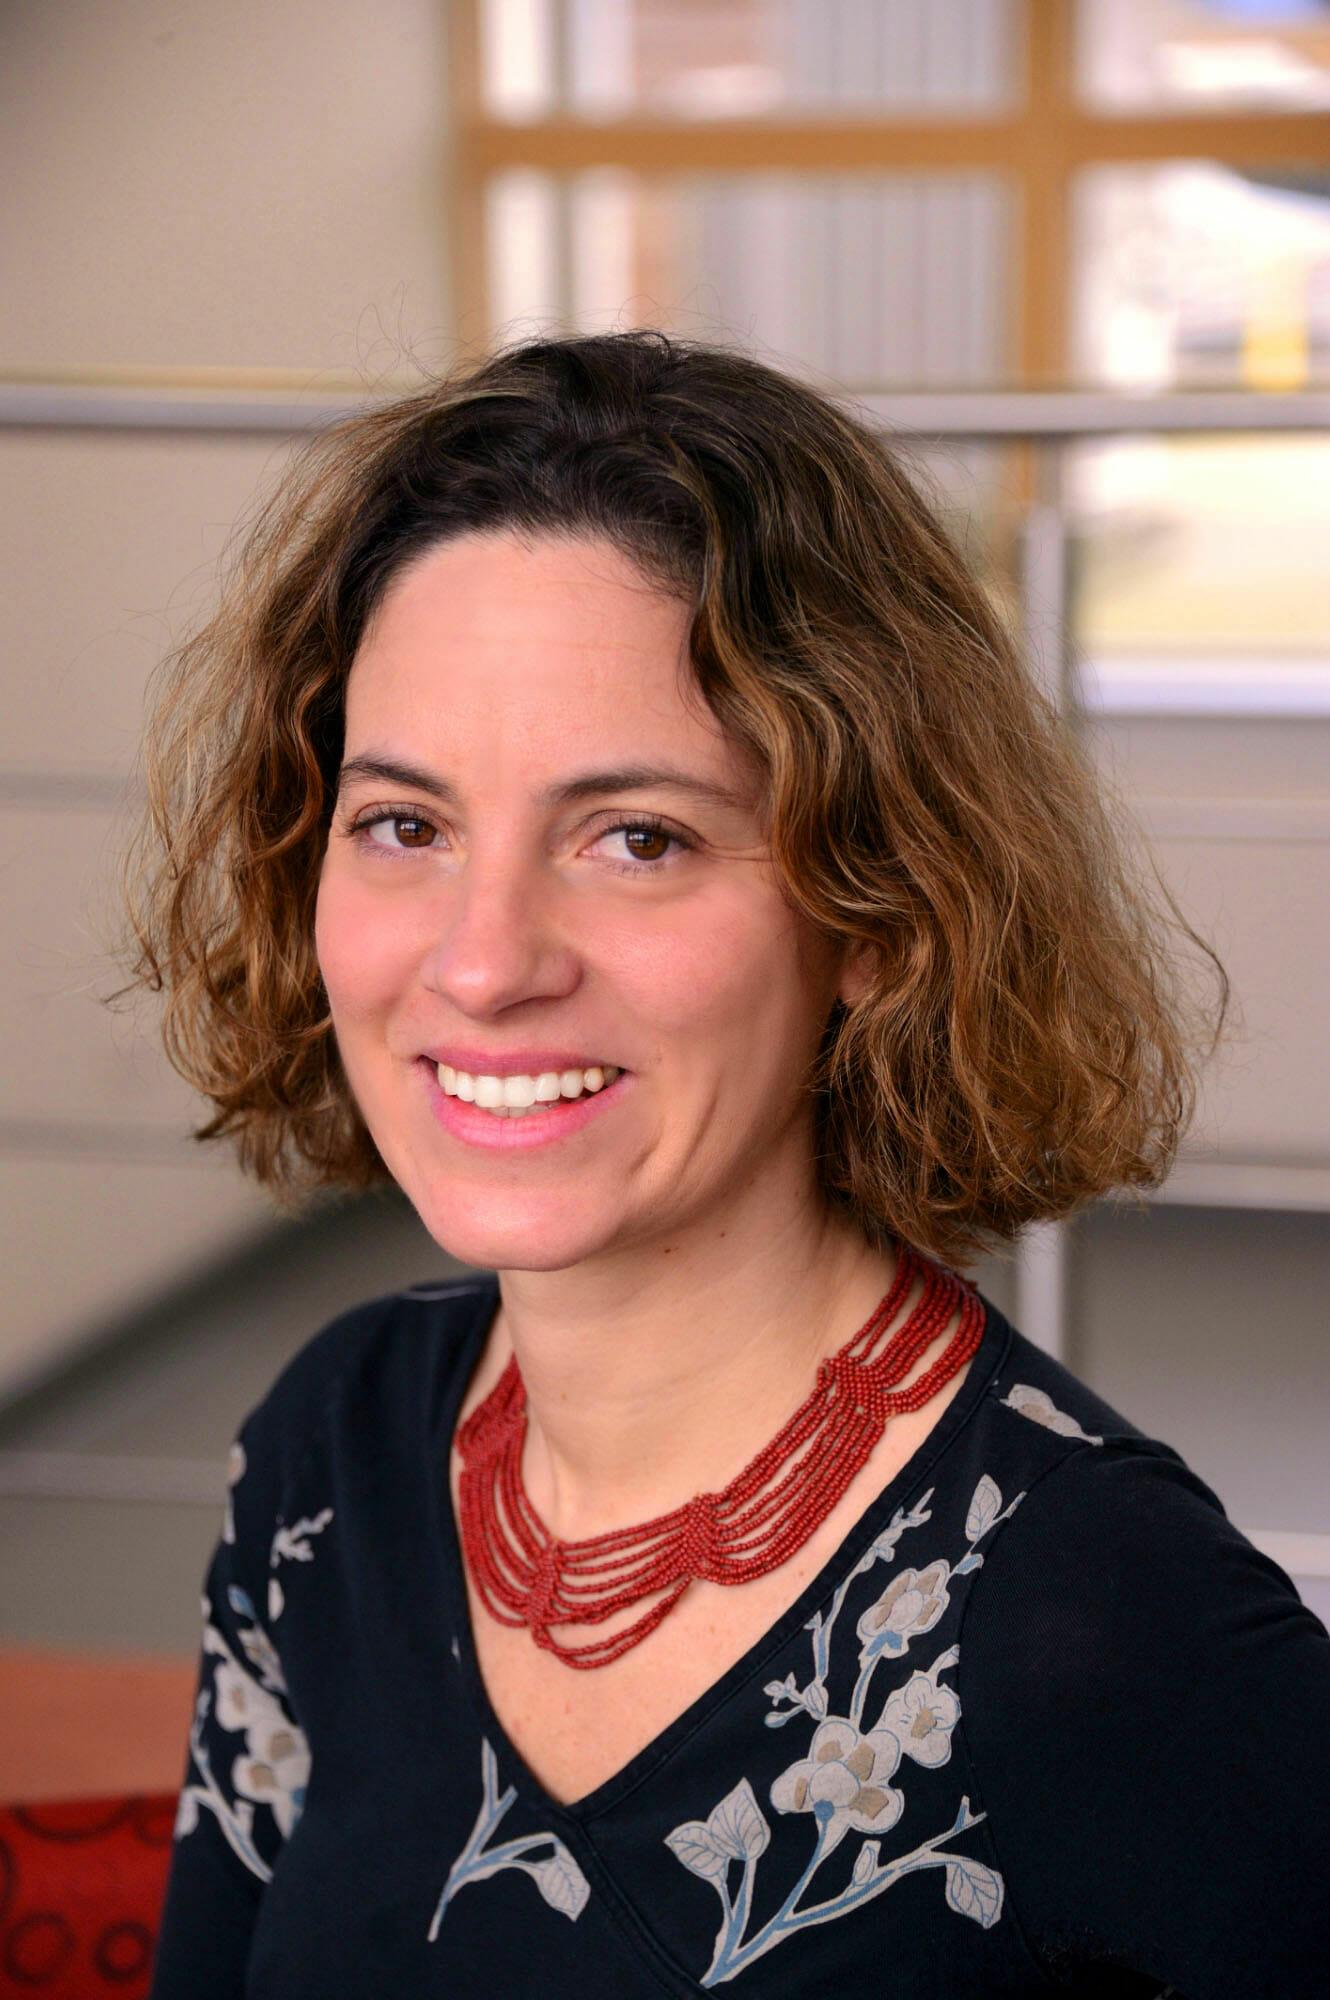 Olivia Casanueva. Group Leader at the epigenetics group at the Babraham Institute.